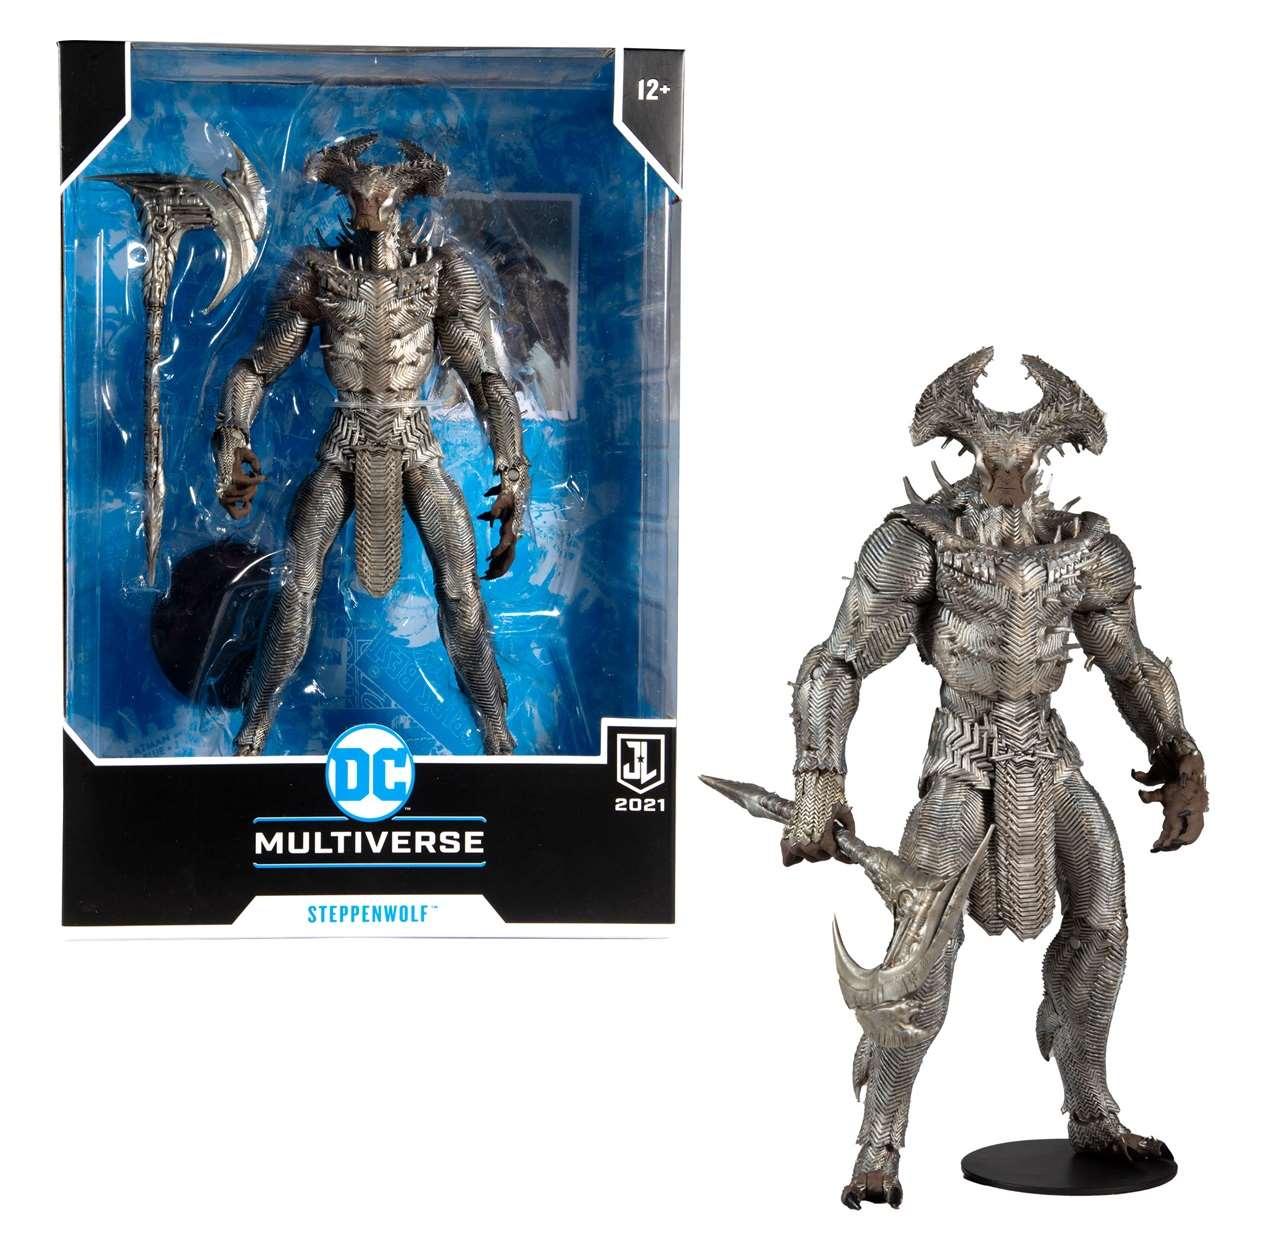 Steppenwolf Figura Justice League 2021 Mcfarlane Zack Snyder